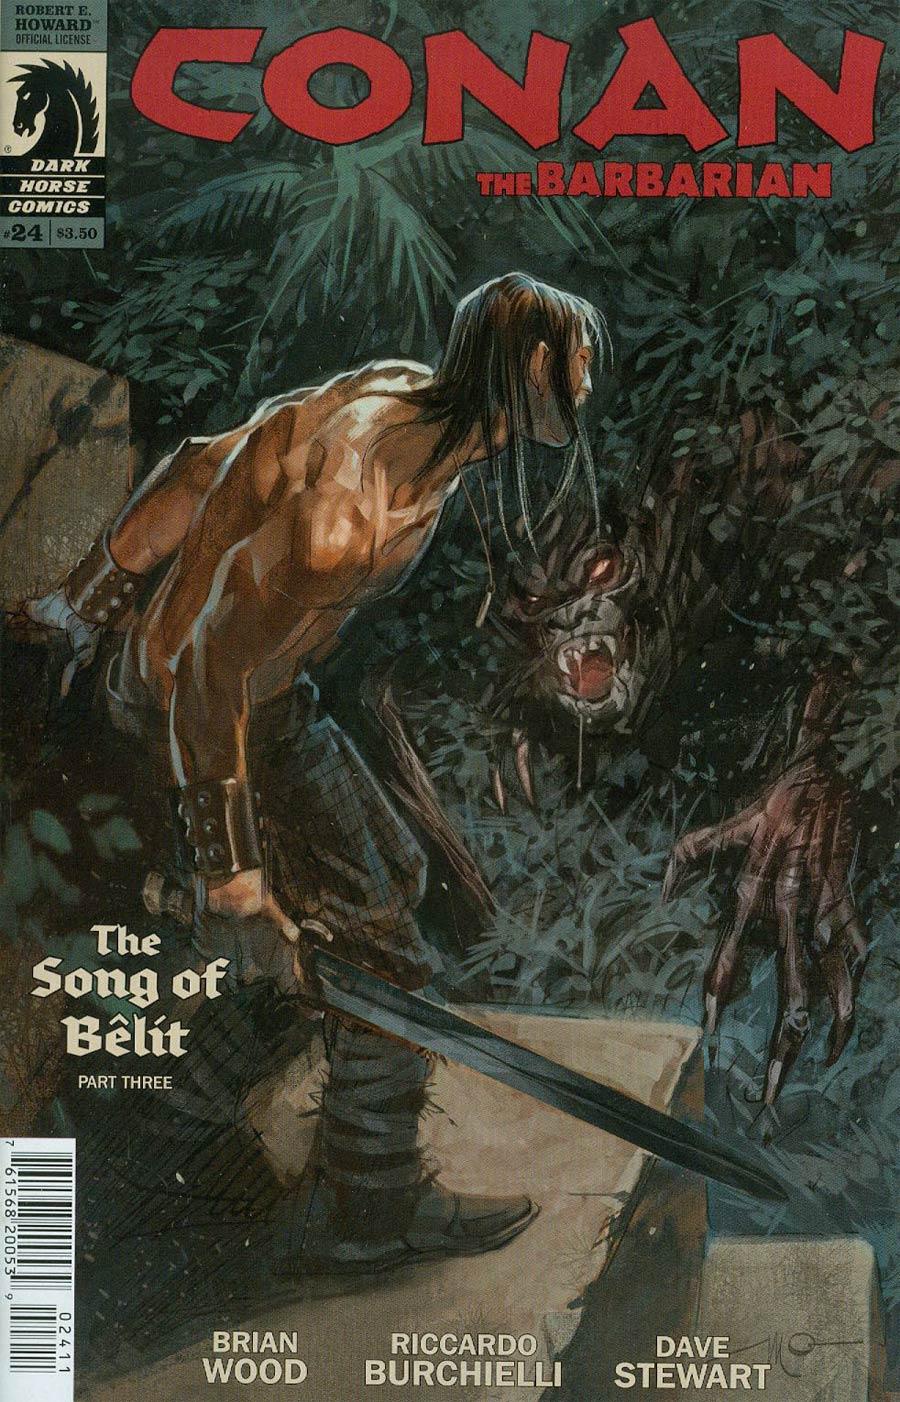 Conan The Barbarian Vol 3 #24